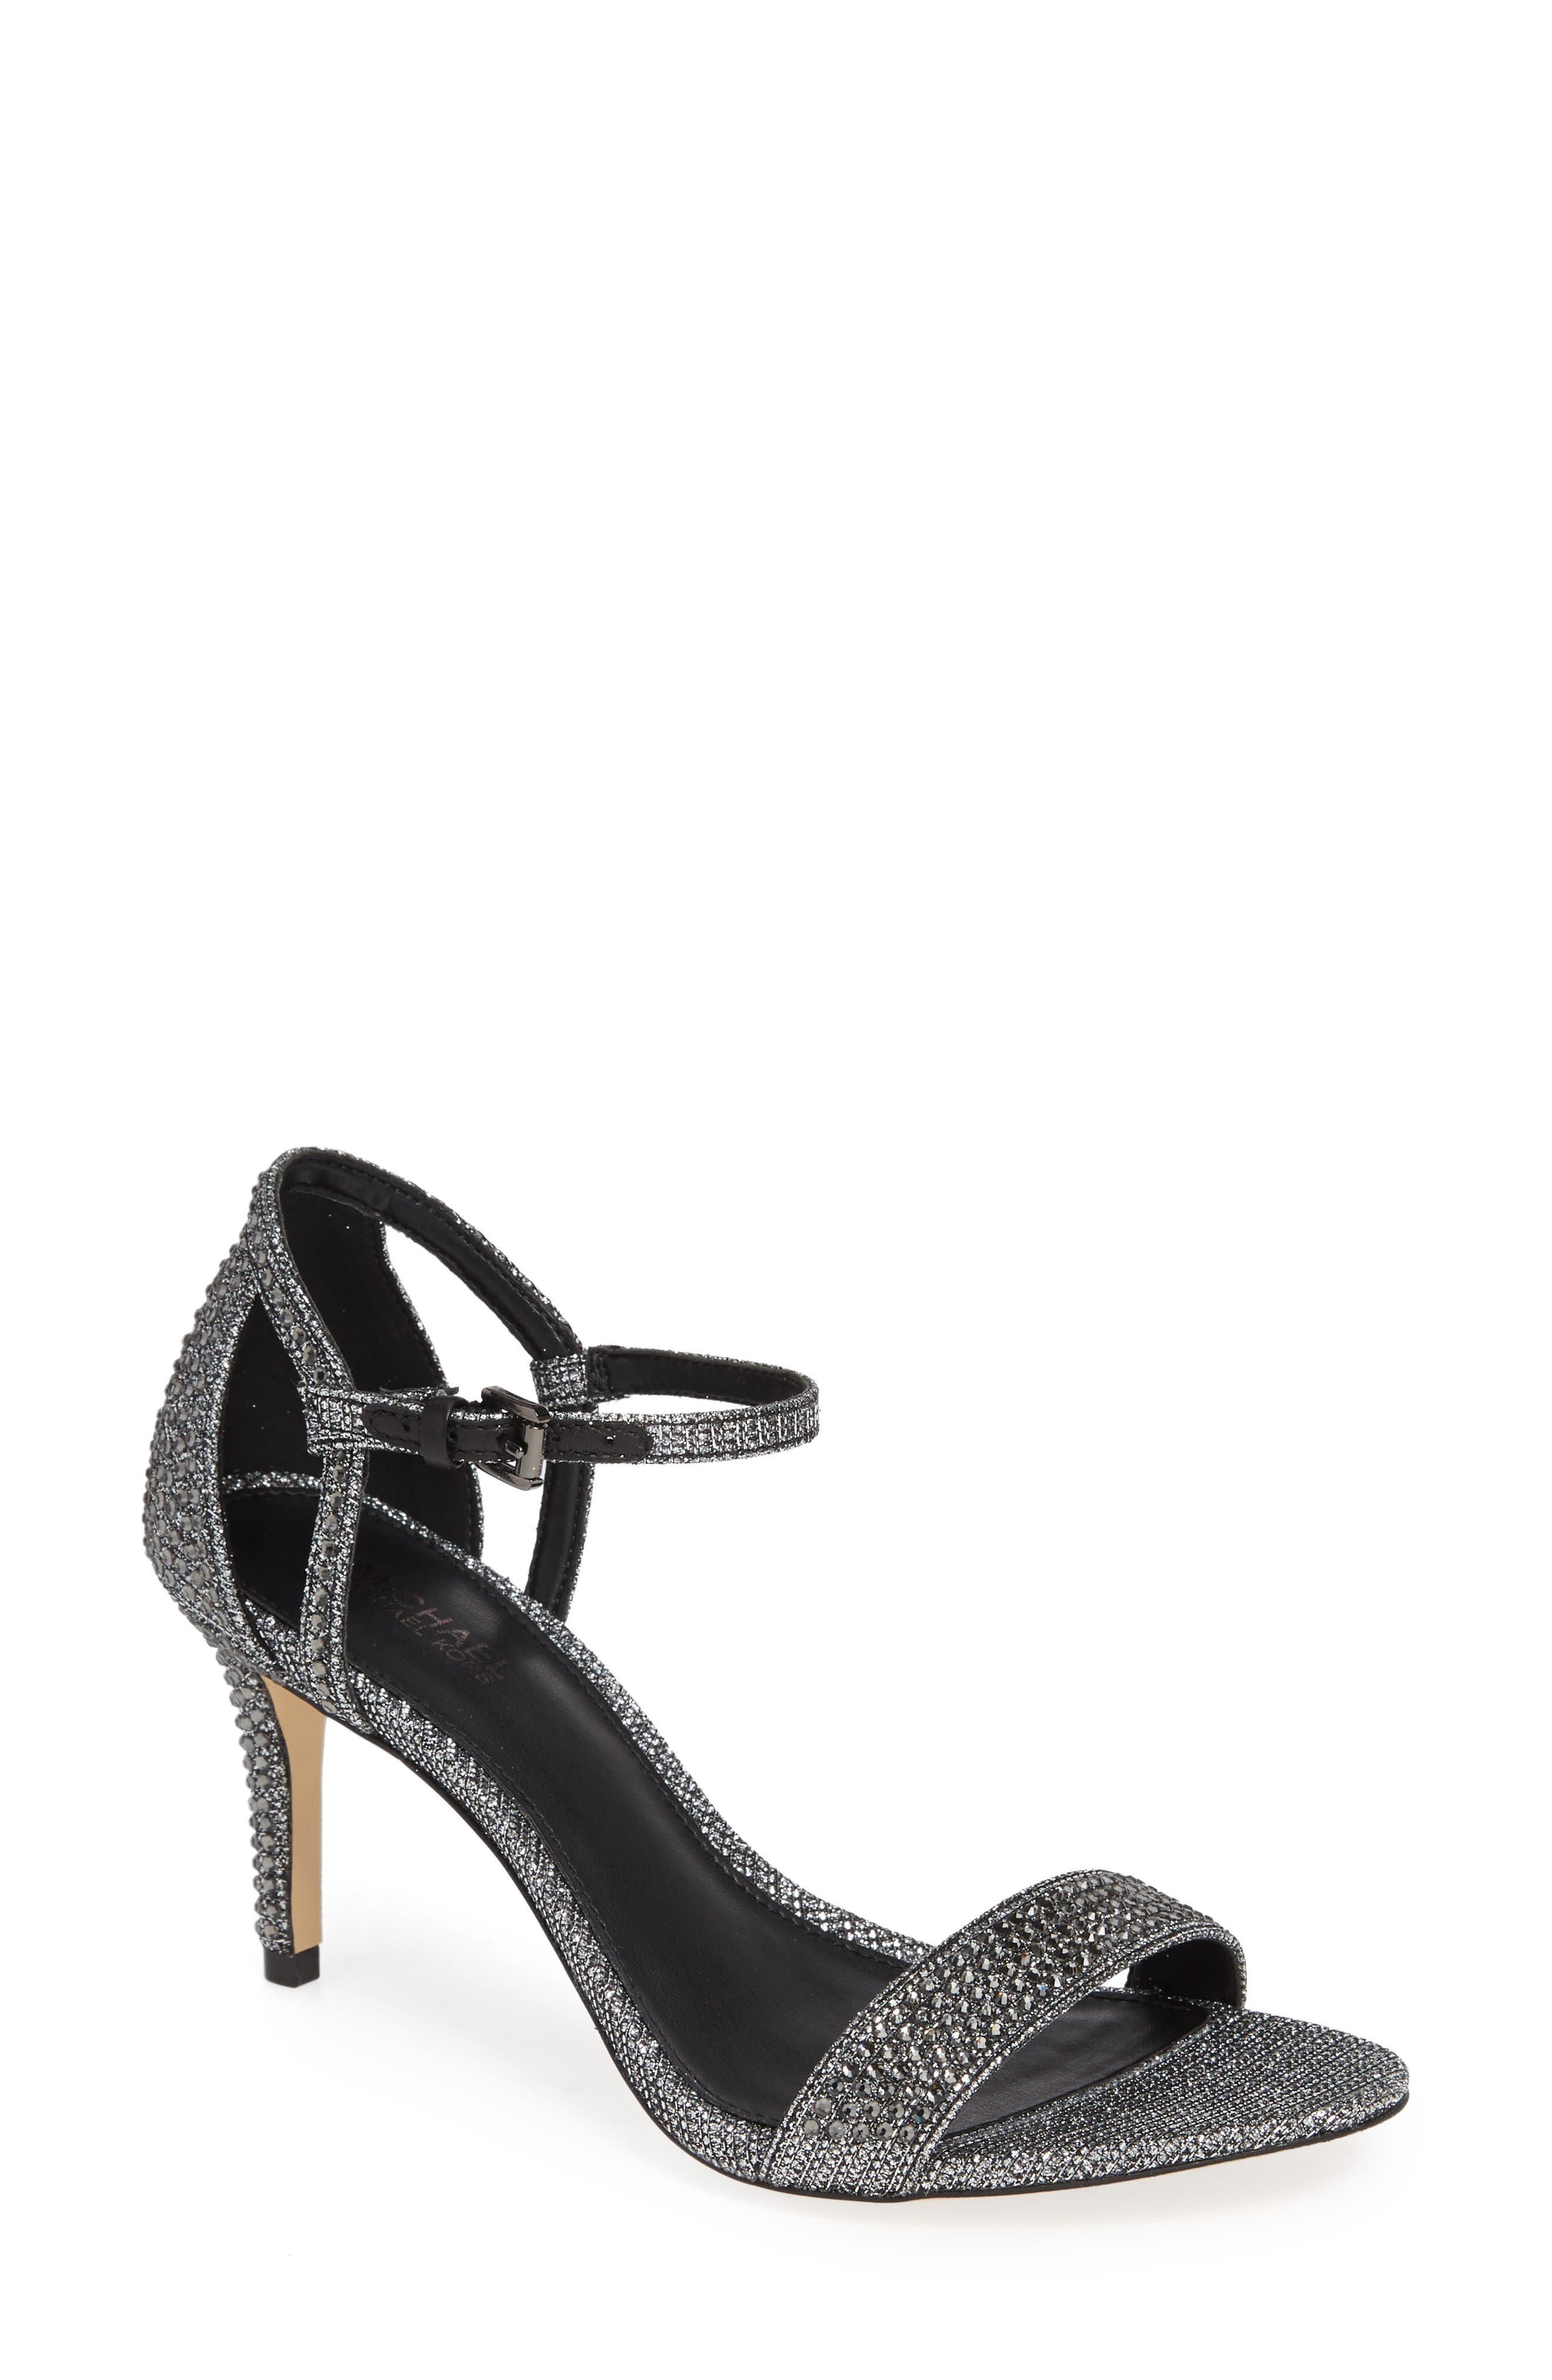 Simone Embellished Sandal,                         Main,                         color, 040